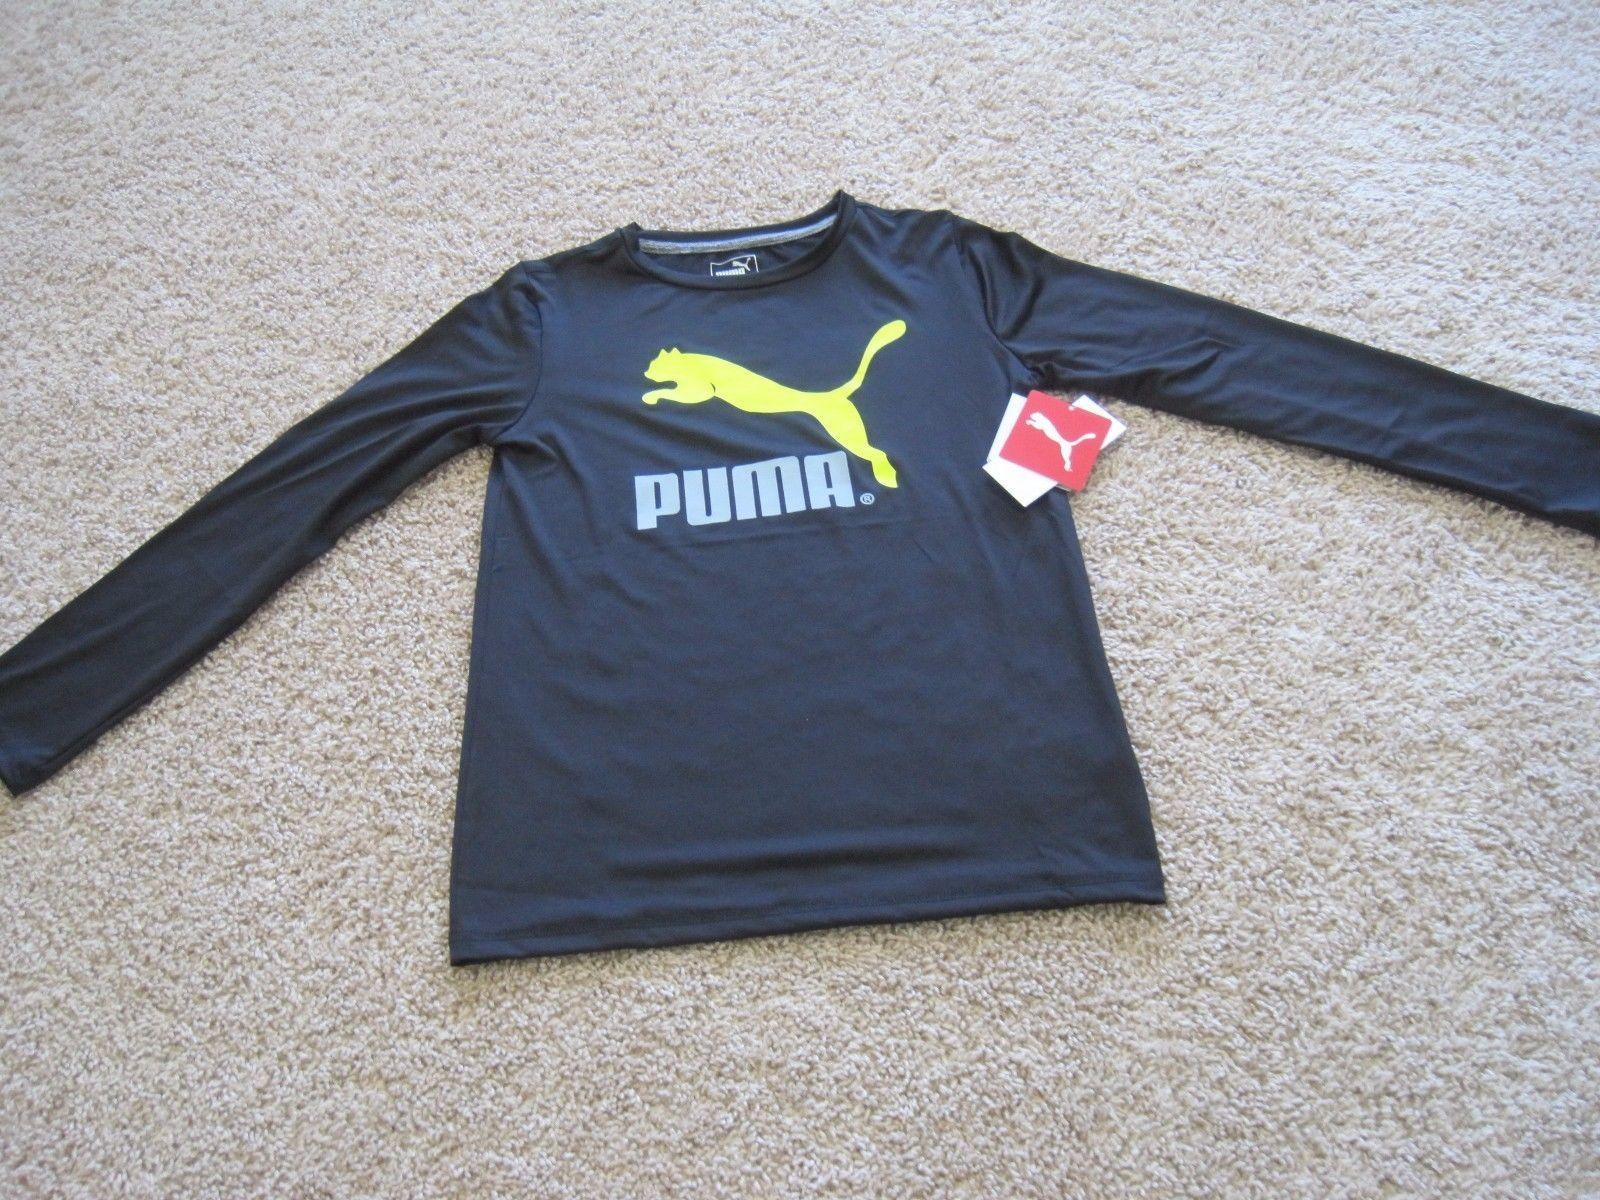 8ee3f45f1b0 BNWT Puma Cell boys' active t-shirt, long and similar items